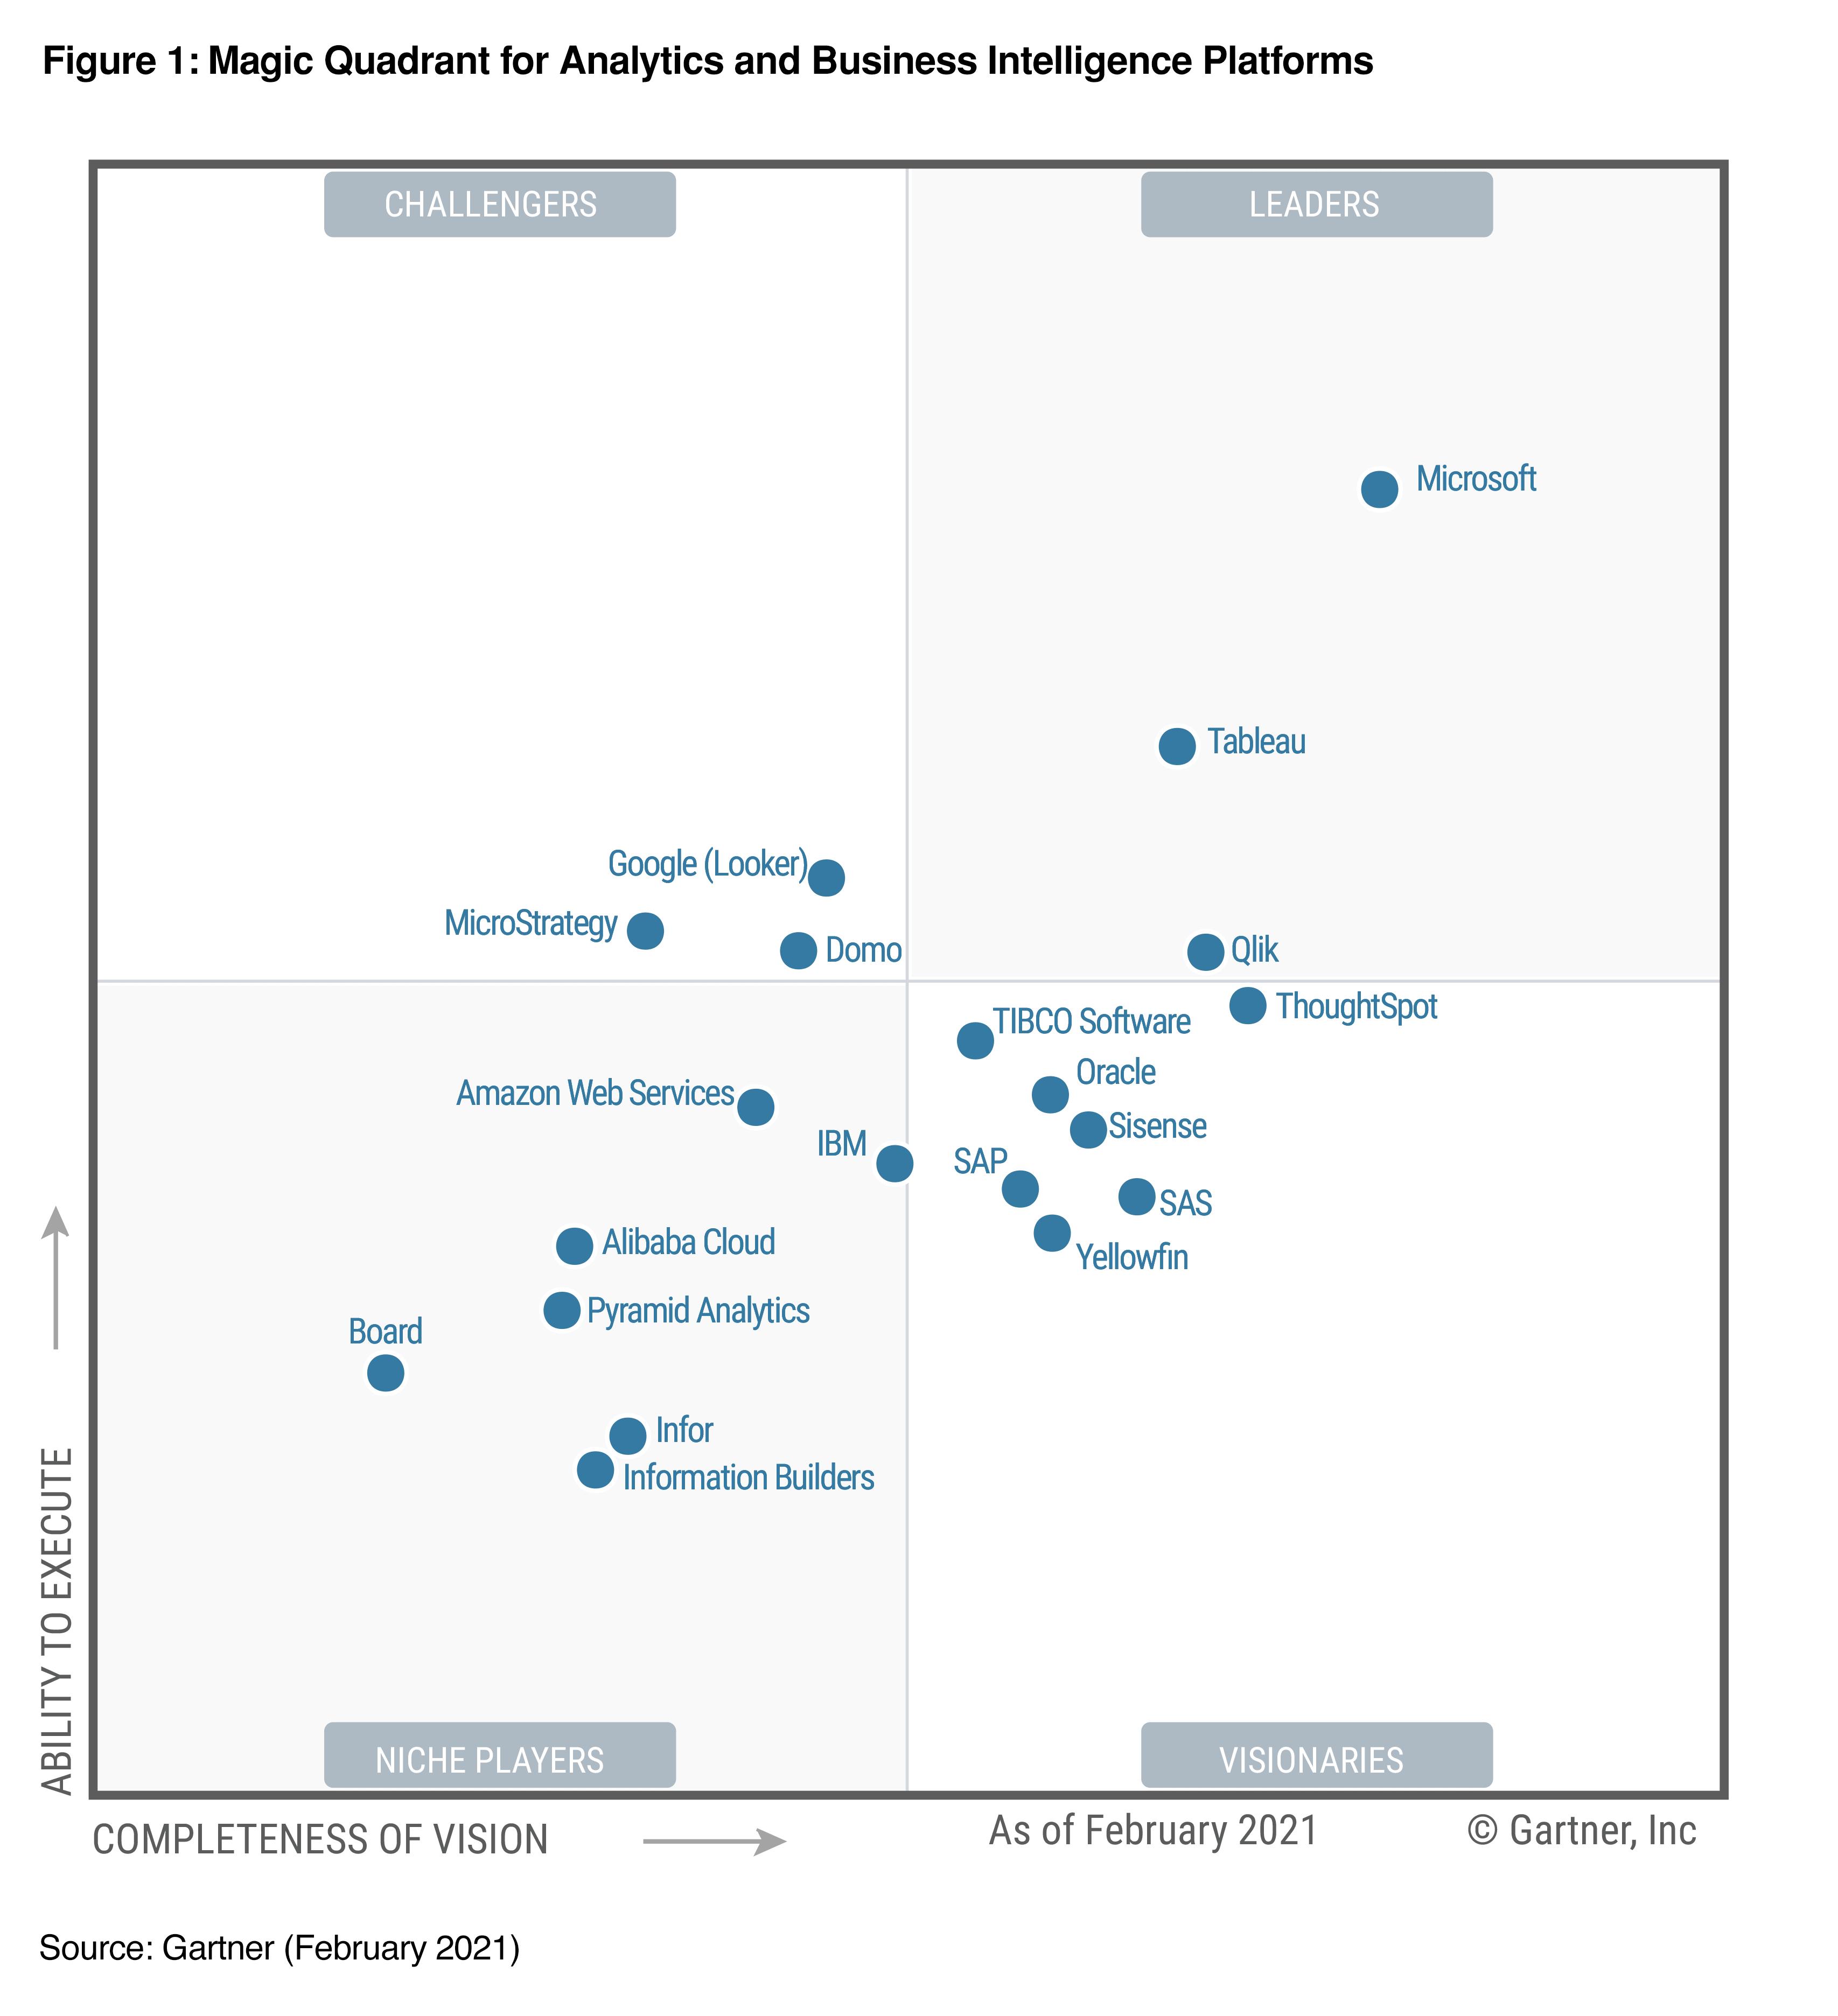 2021 Gartner Magic Quadrant for Analytics and BI Platforms